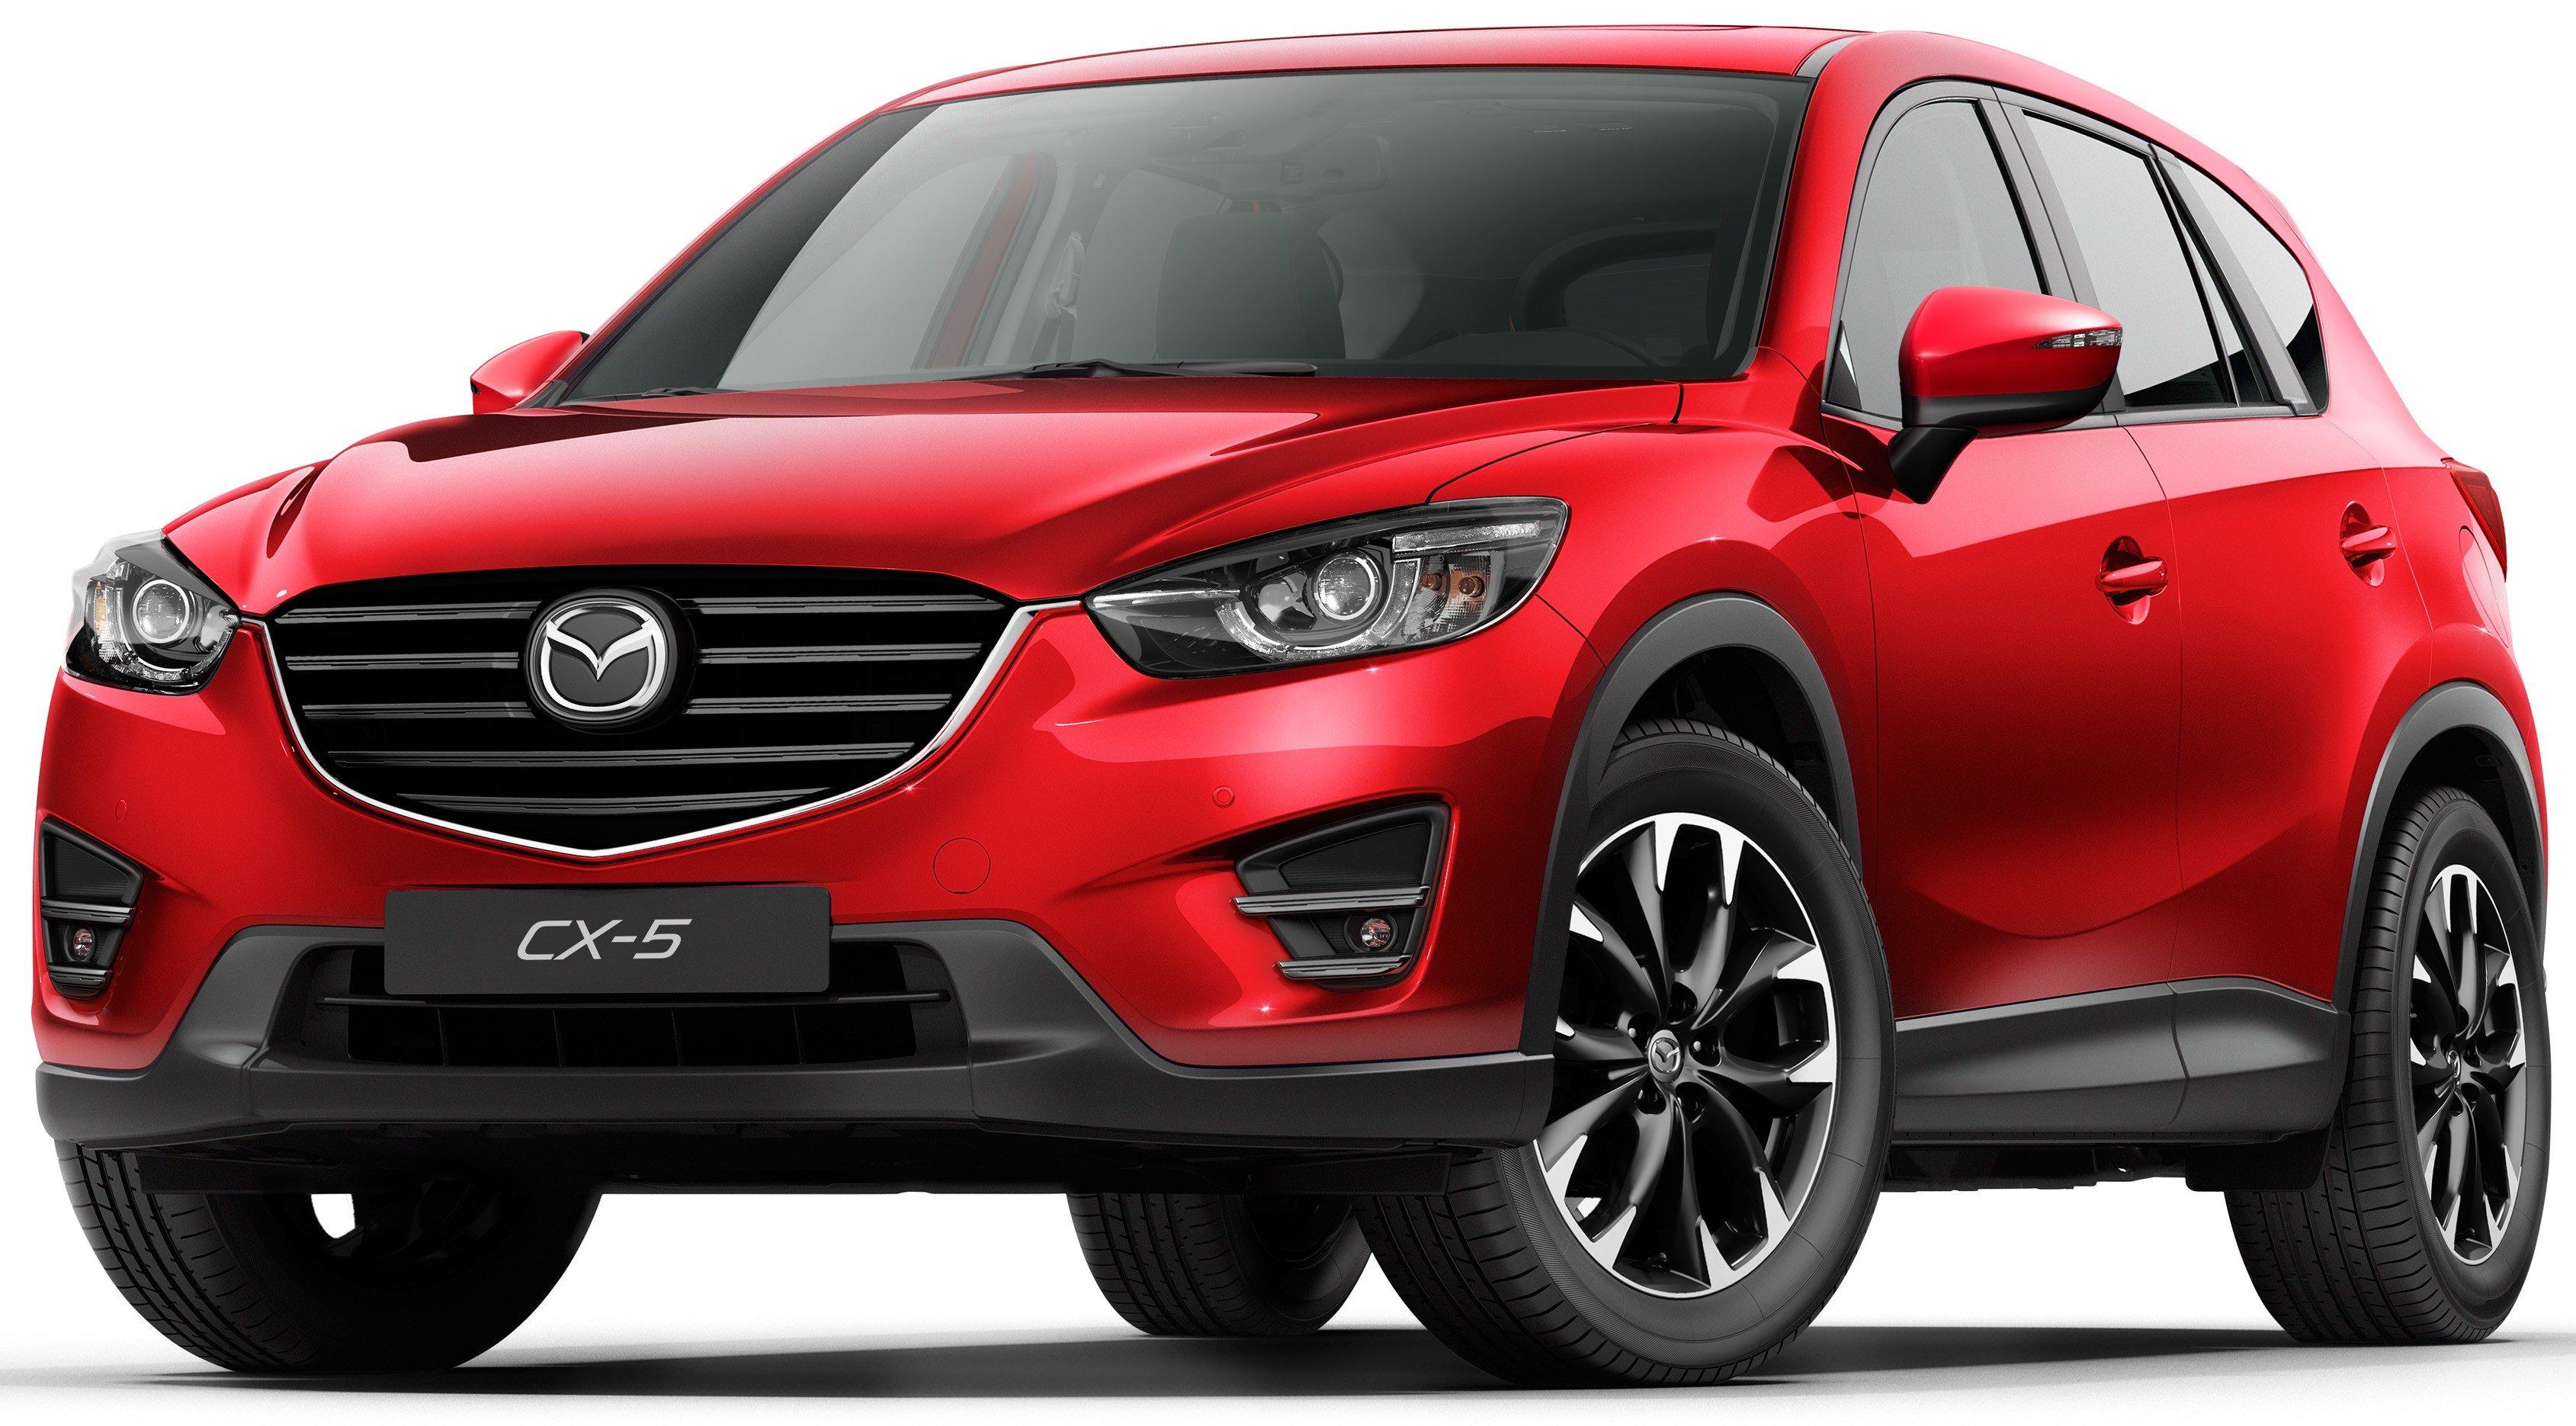 2018 Mazda Cx5 >> Mazda CX-5 facelift appears at LA with minor upgrades Paul Tan - Image 289652